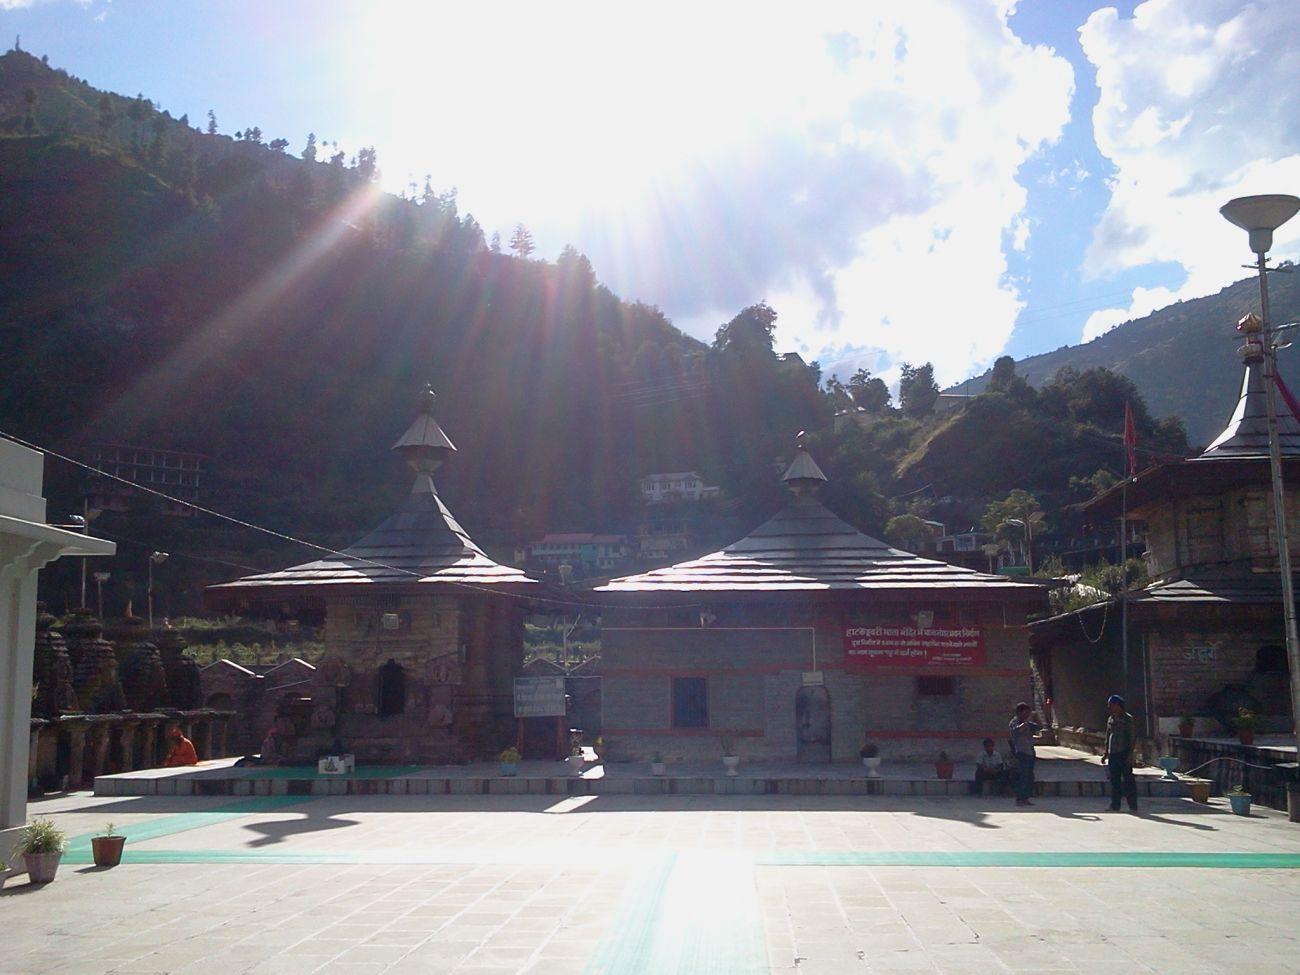 rohru shimla himachal pradesh